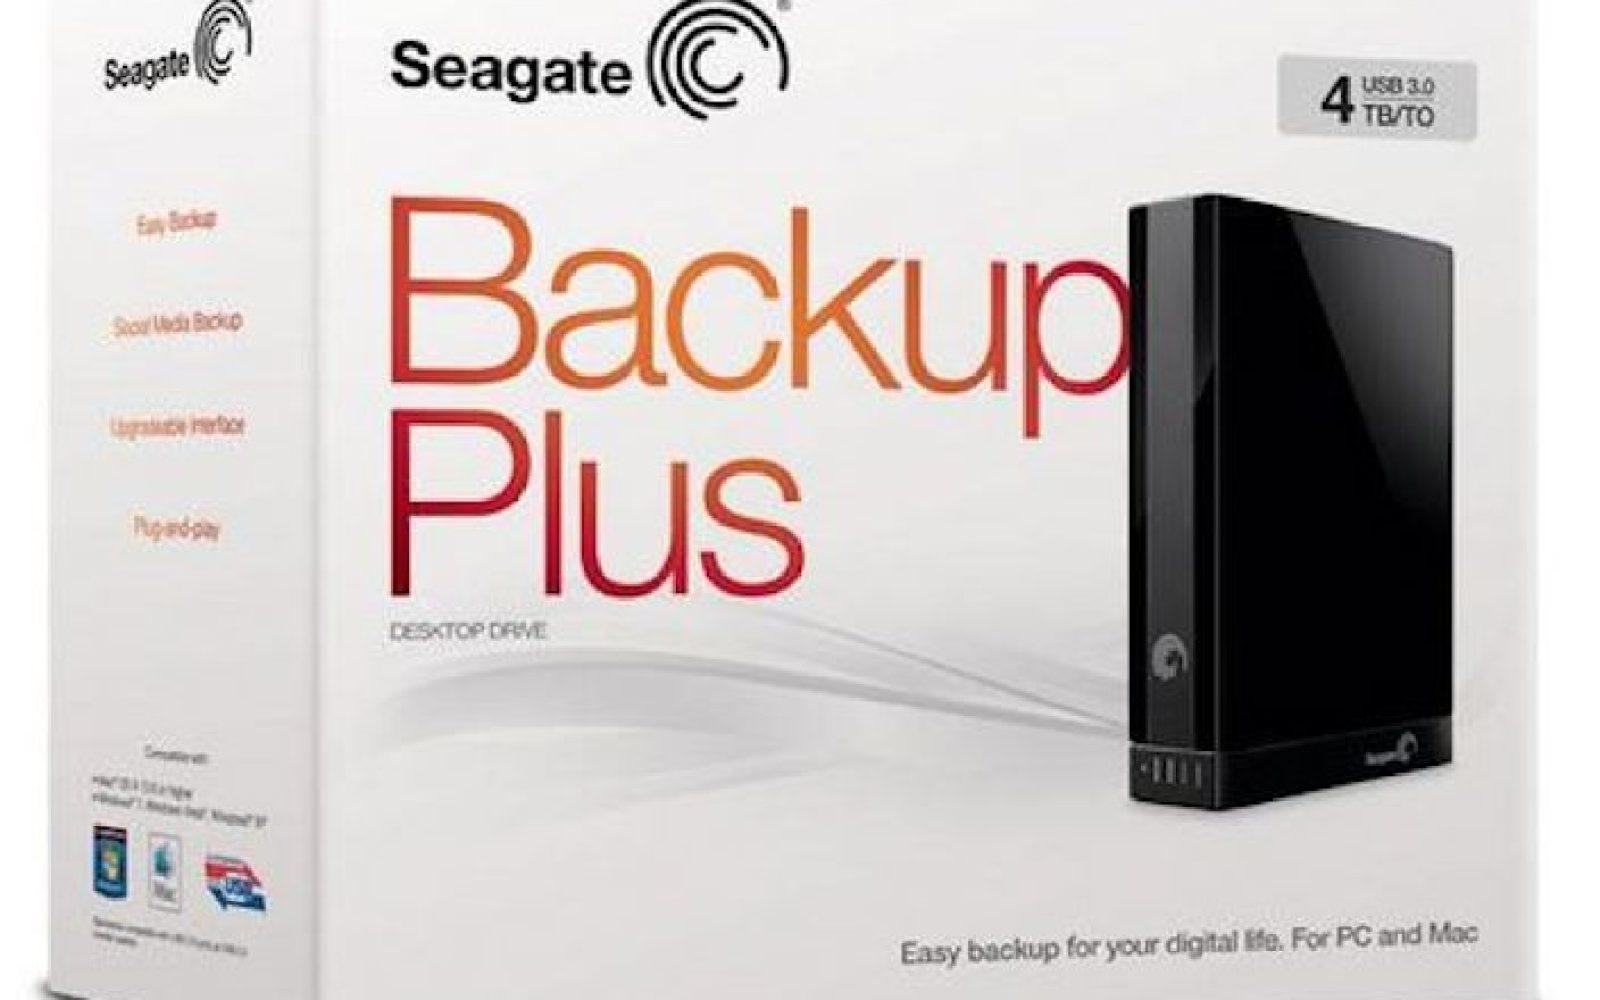 Info Harga Seagate Backup Plus Ultra Slim 1tb Steh1000301 Gold Portable Hdd Eksternal5tb 25inch Usb30 Merah Free Pouch Pen 9to5toys